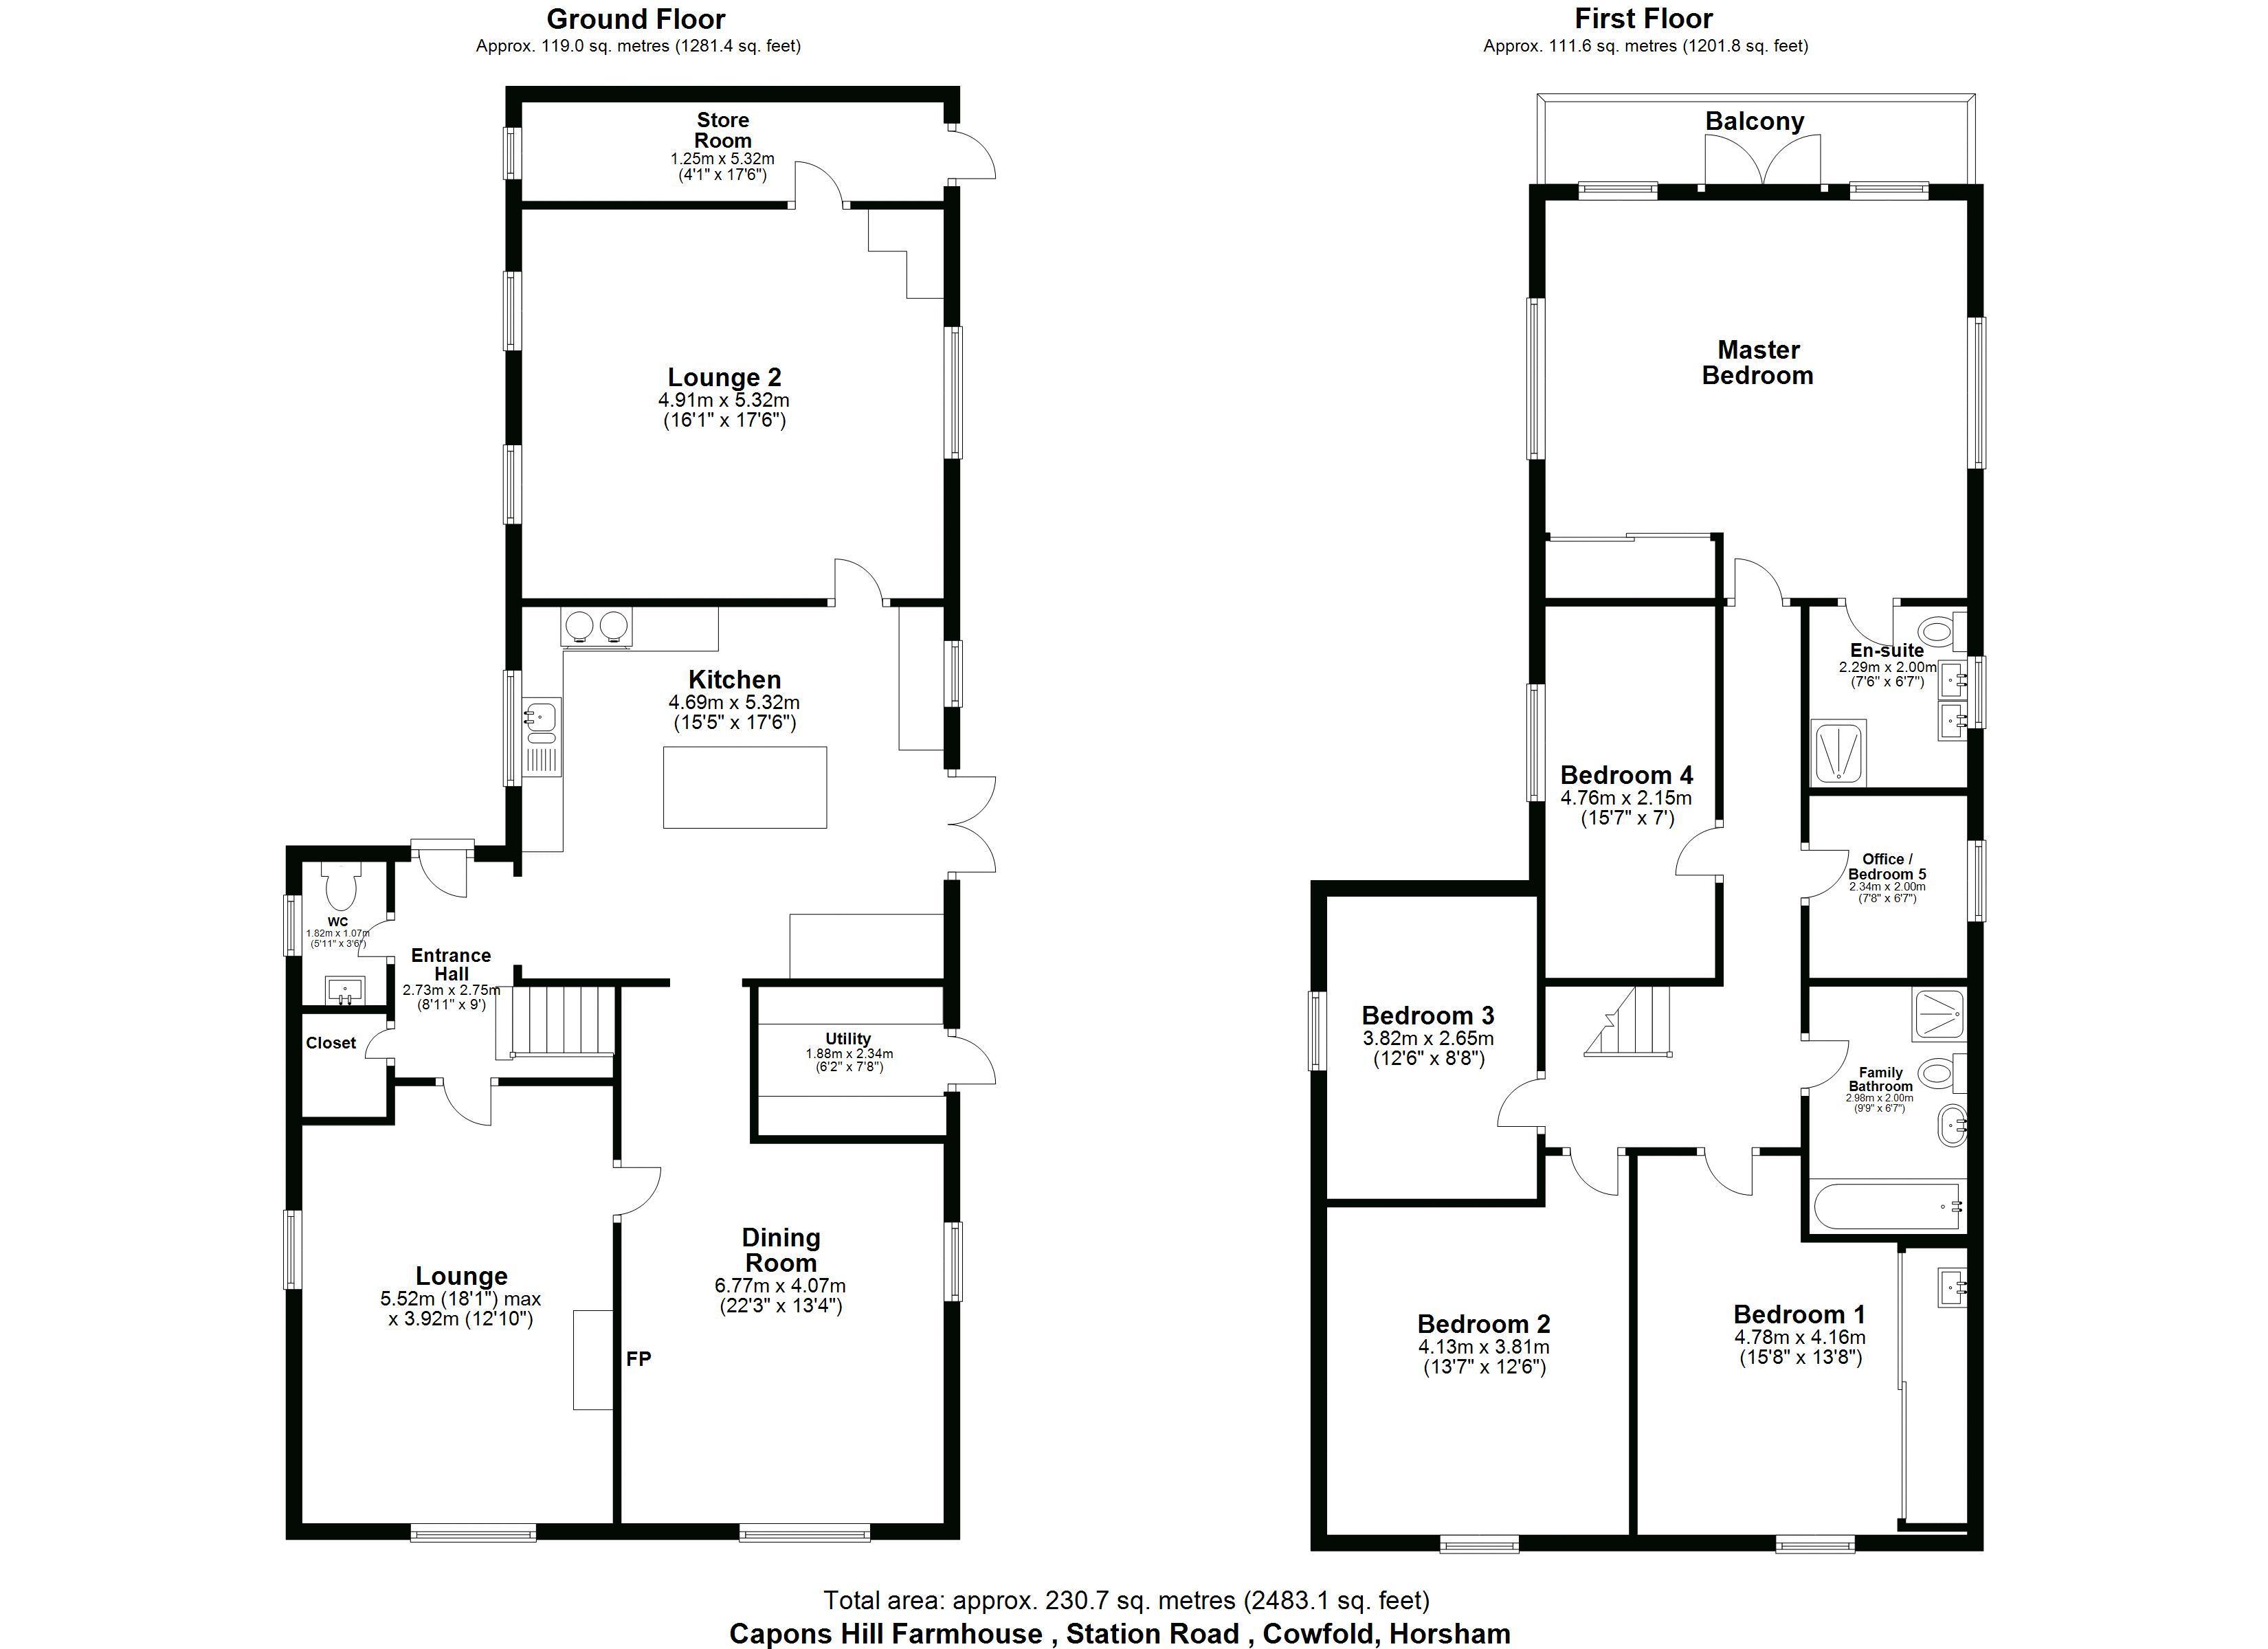 Capons Hill floorplan